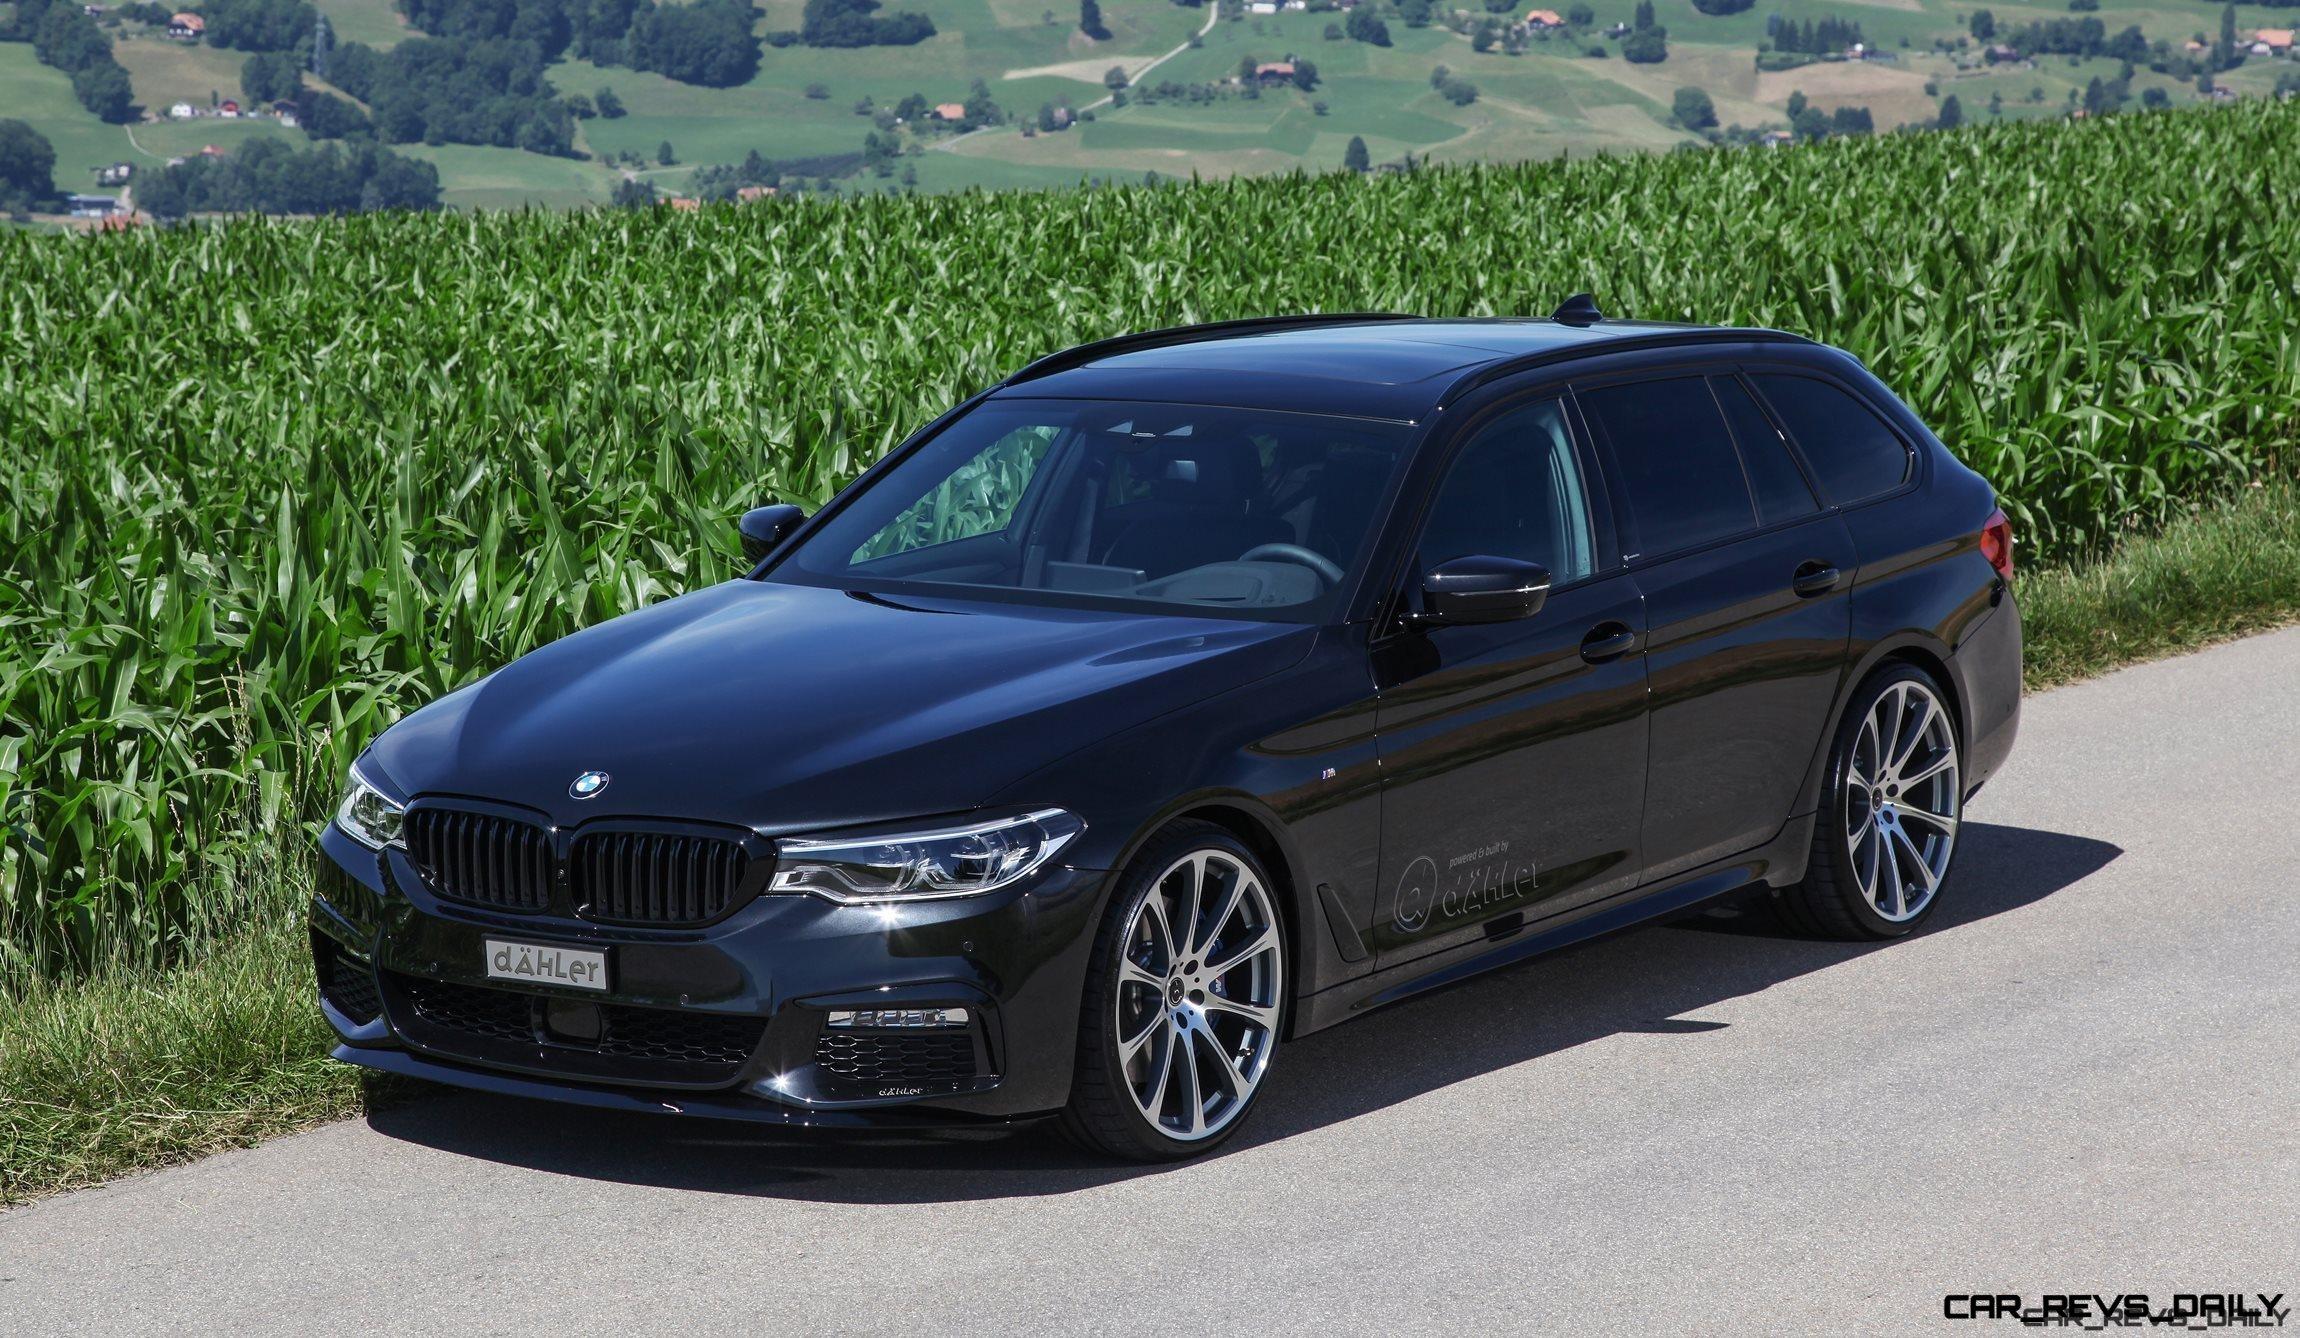 DAHLER Tunes Up New BMW 5-Series Touring - ECU, Remote